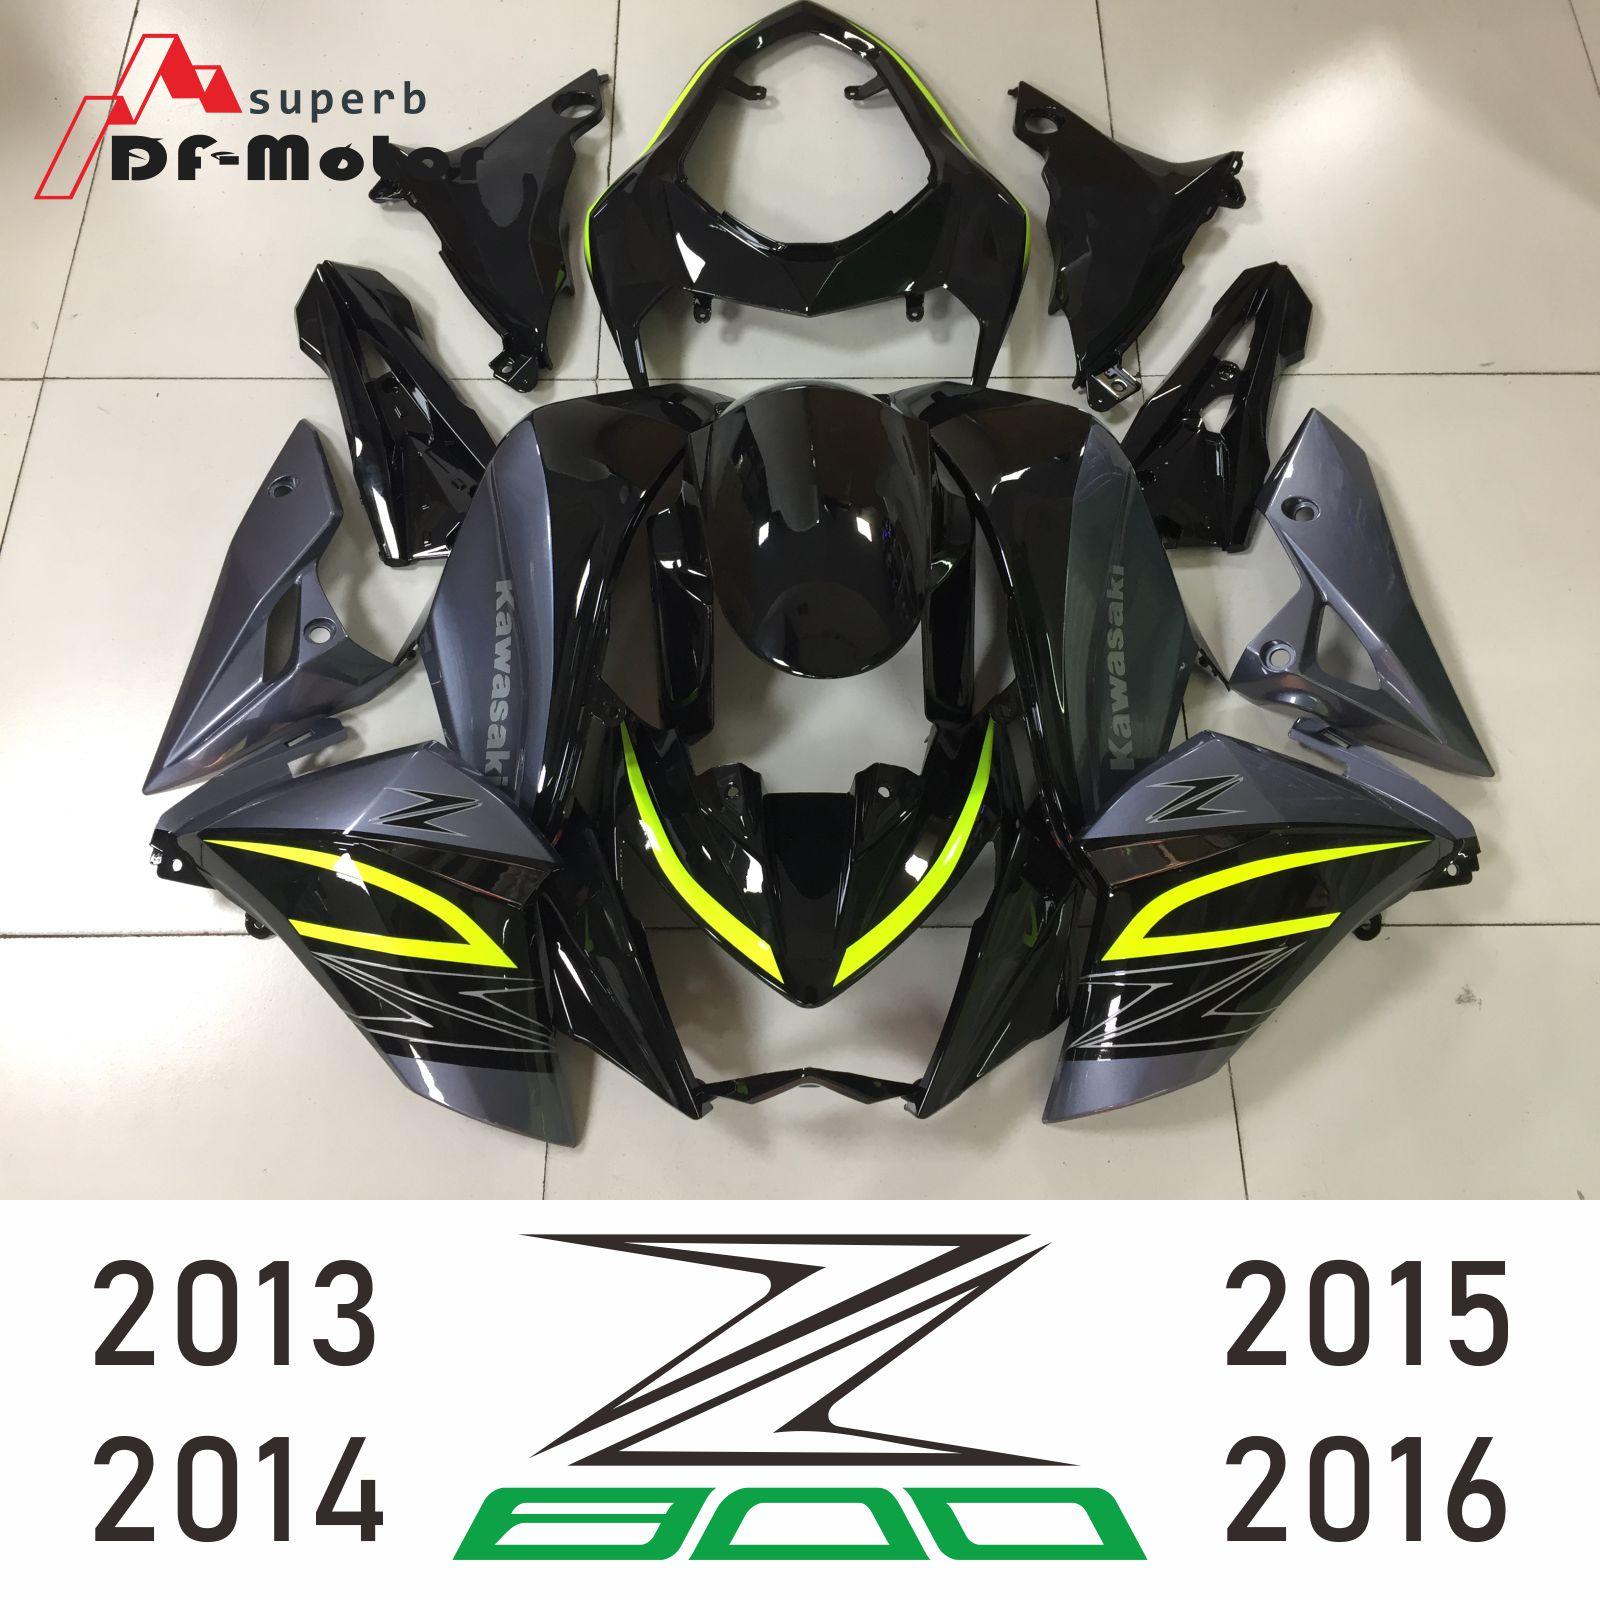 For Kawasaki Z800 2013 2014 2015 2016 Z-800 13 14 15 16 Bodyworks Aftermarket Motorcycle Fairing (Injection molding)For Kawasaki Z800 2013 2014 2015 2016 Z-800 13 14 15 16 Bodyworks Aftermarket Motorcycle Fairing (Injection molding)